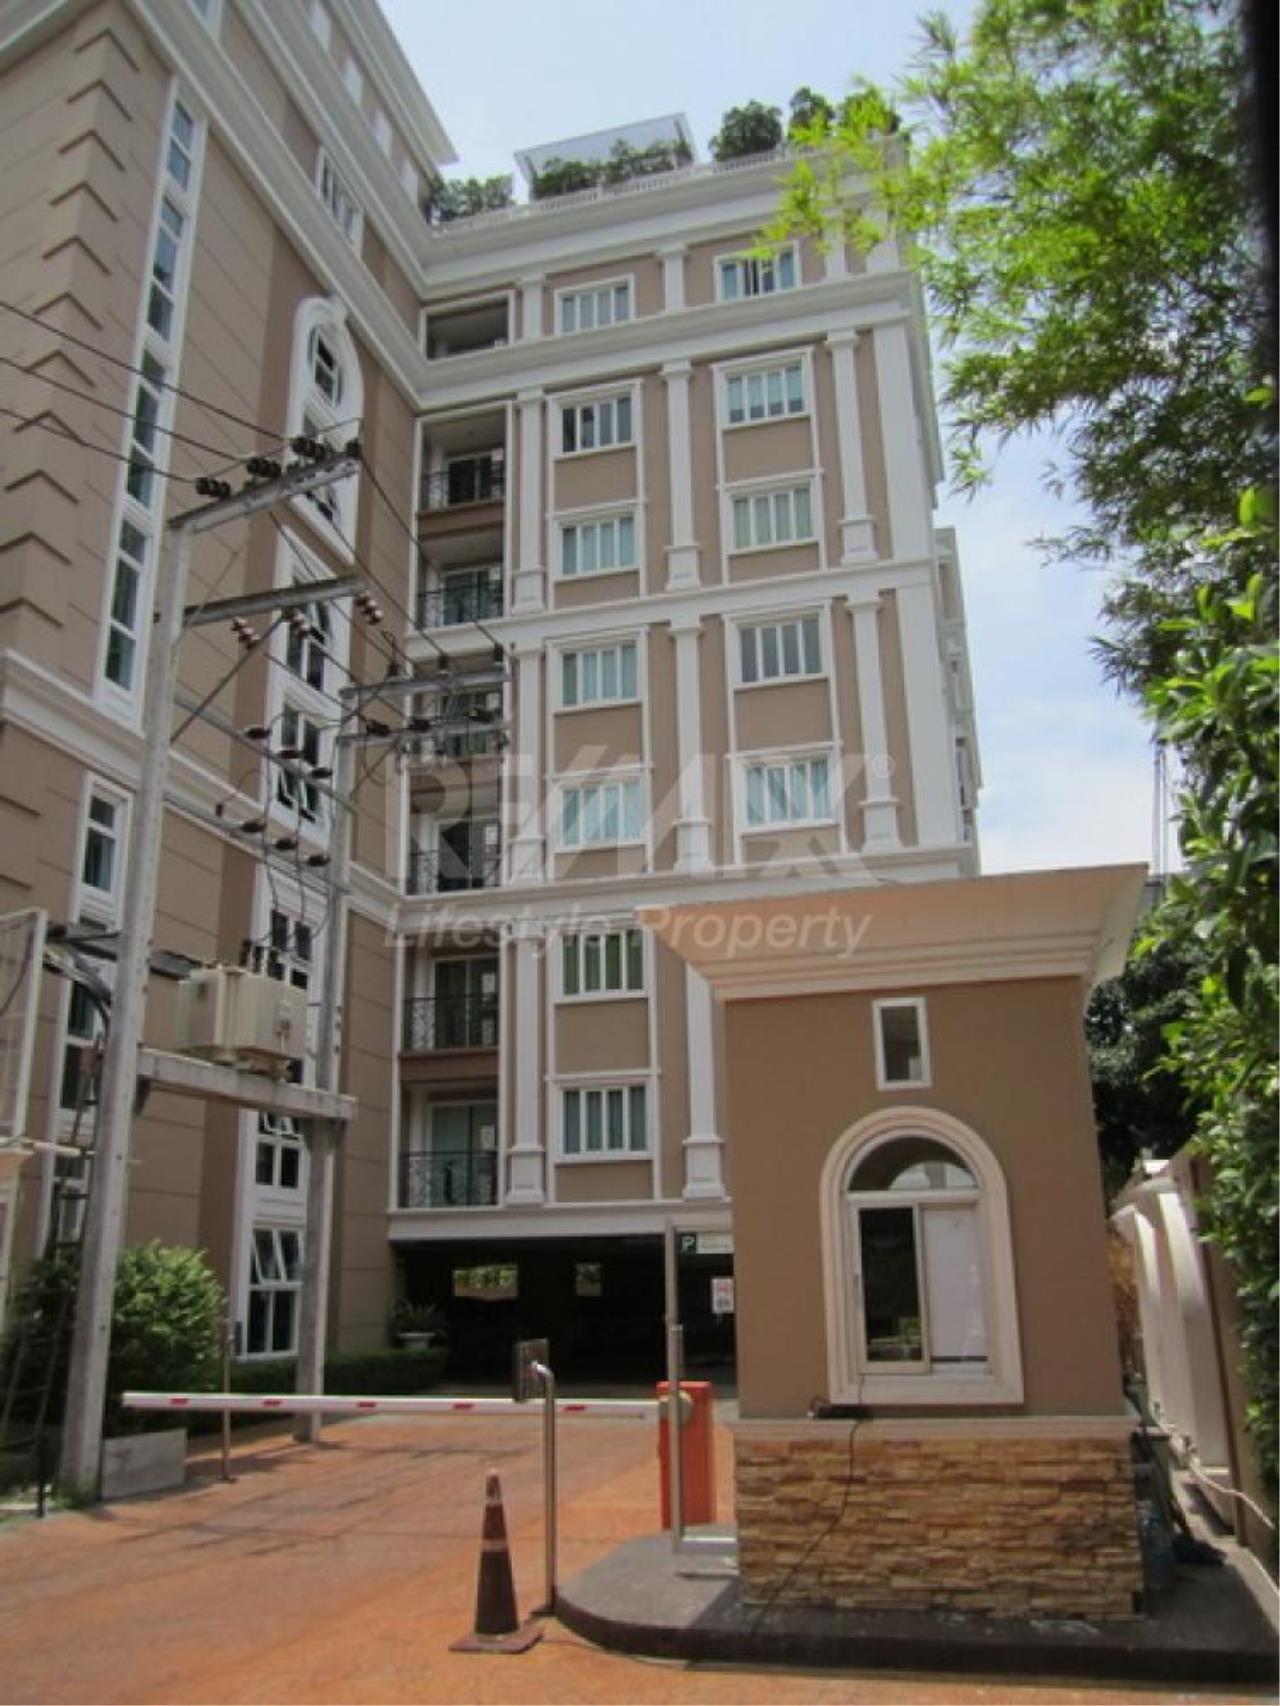 RE/MAX LifeStyle Property Agency's Le Nice Ekamai 1